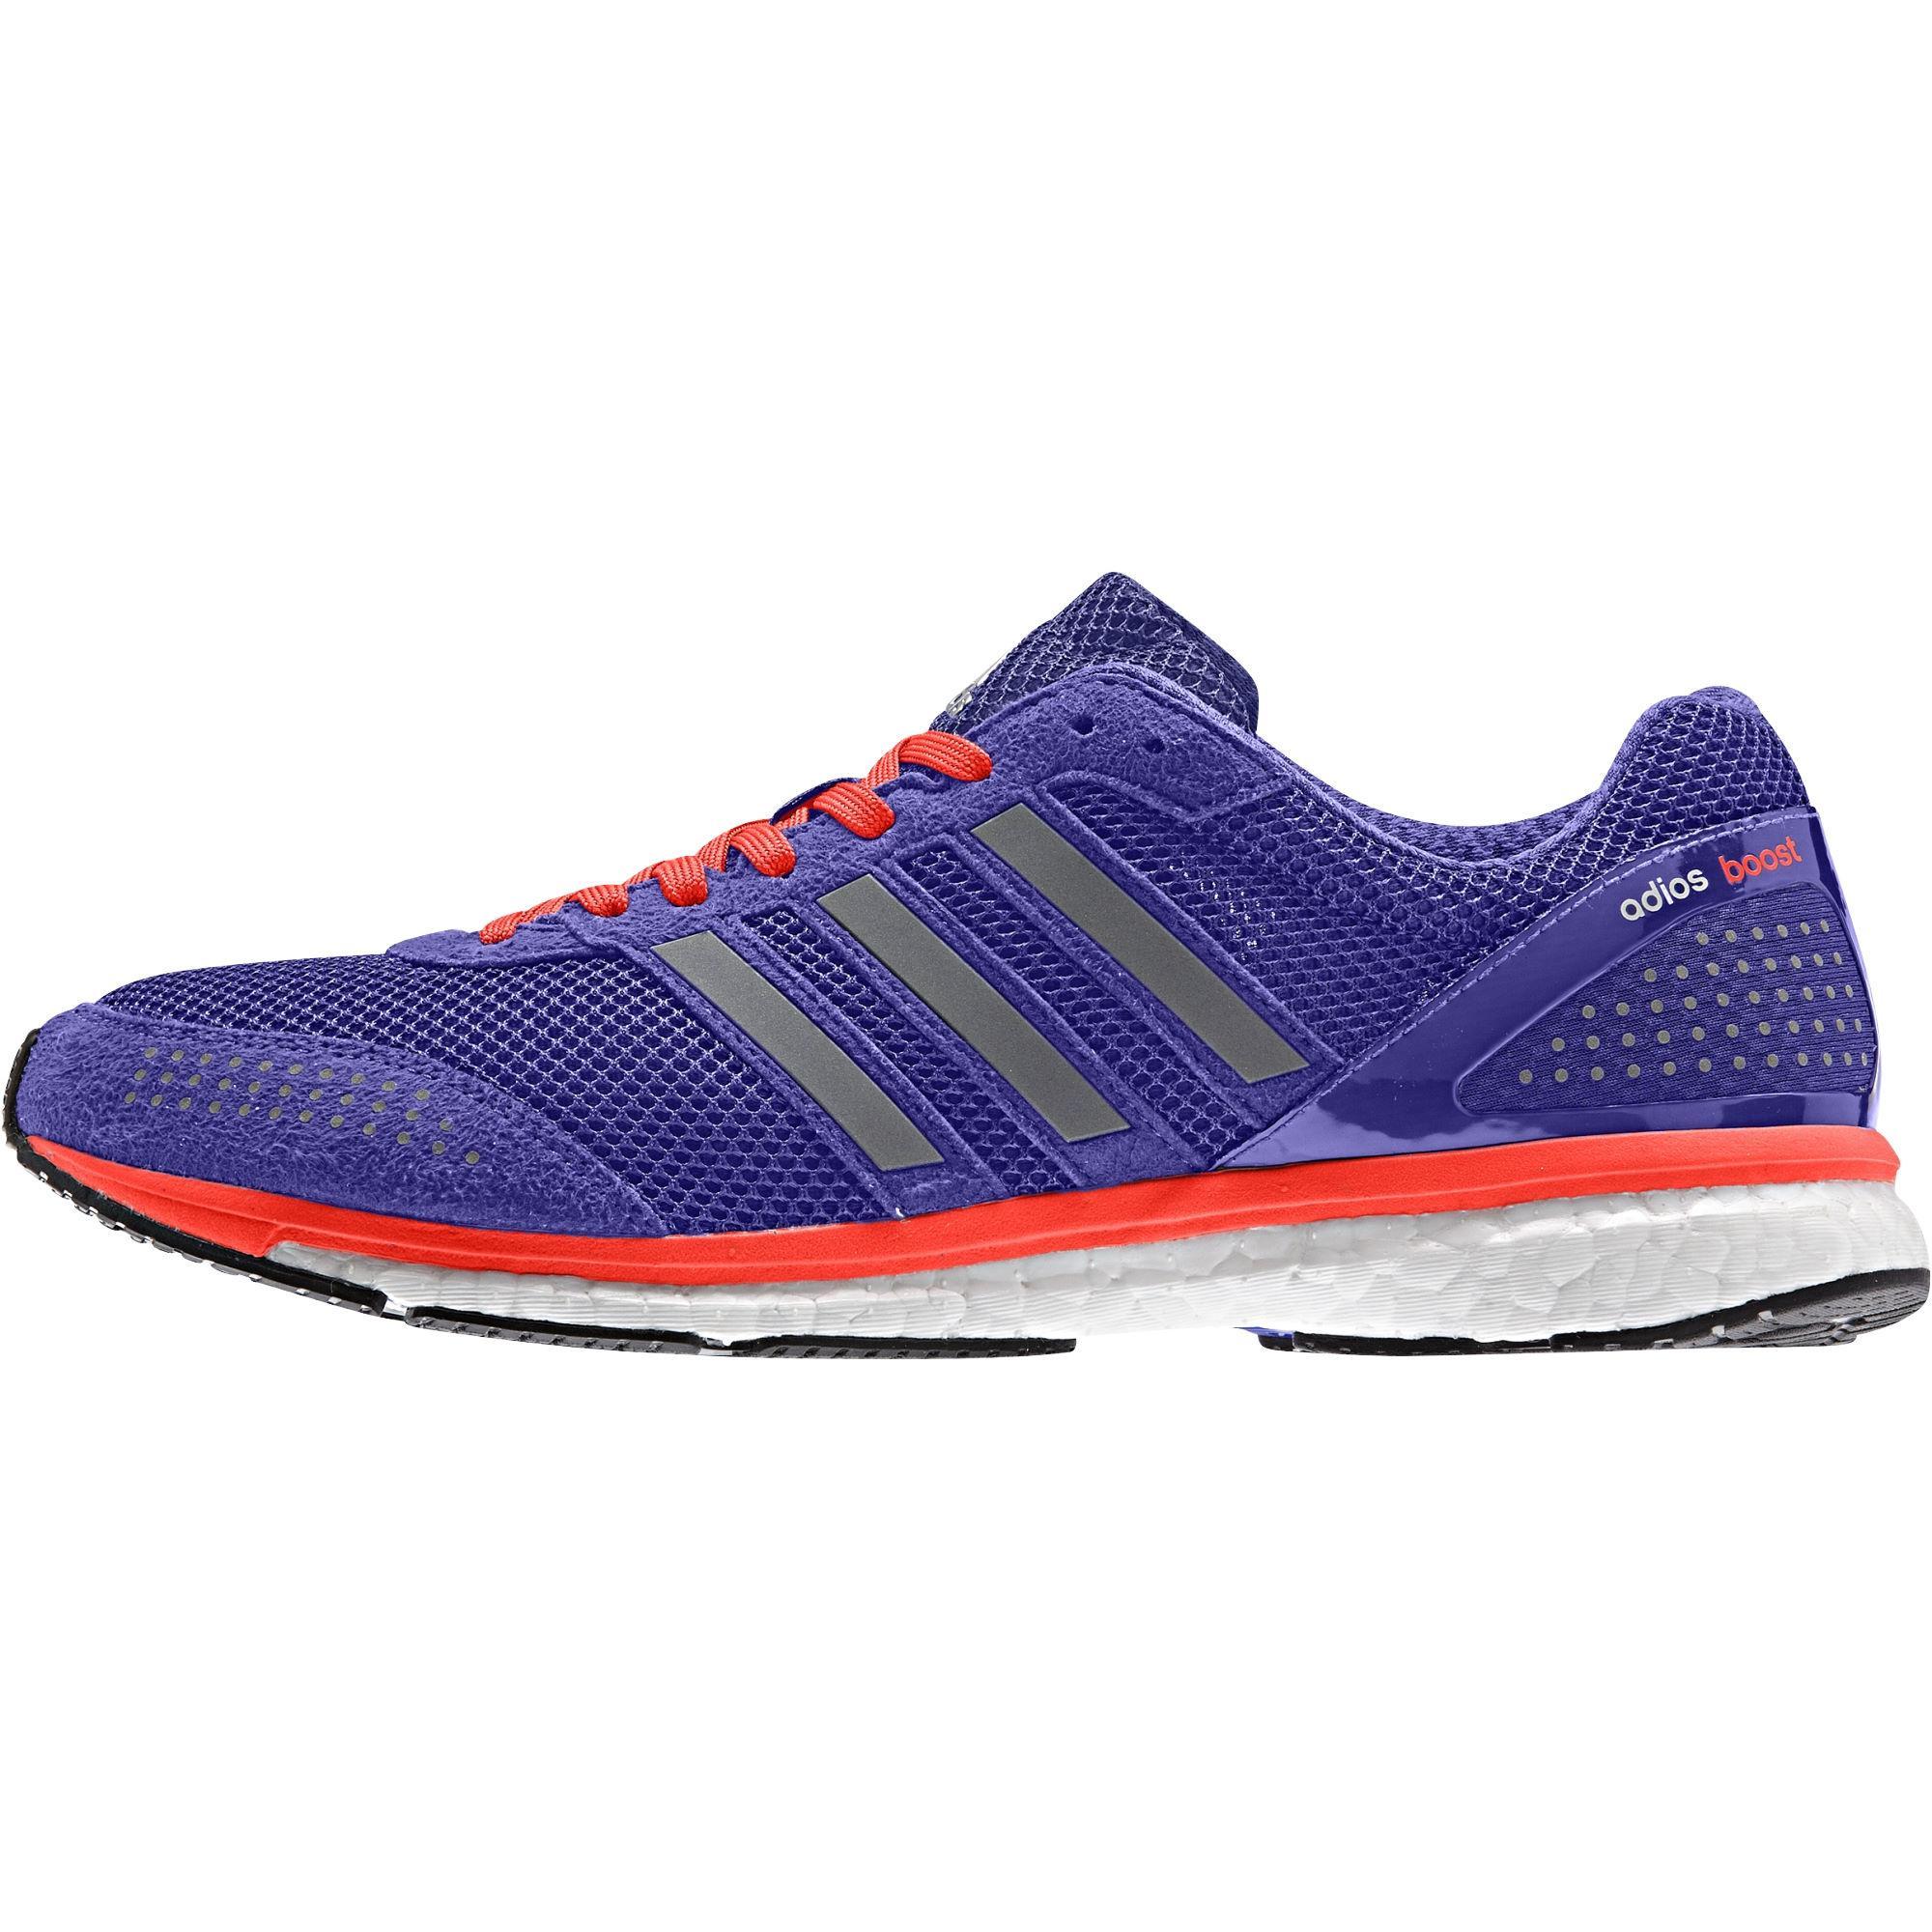 Adizero Adios Boost Ltd Shoes Review